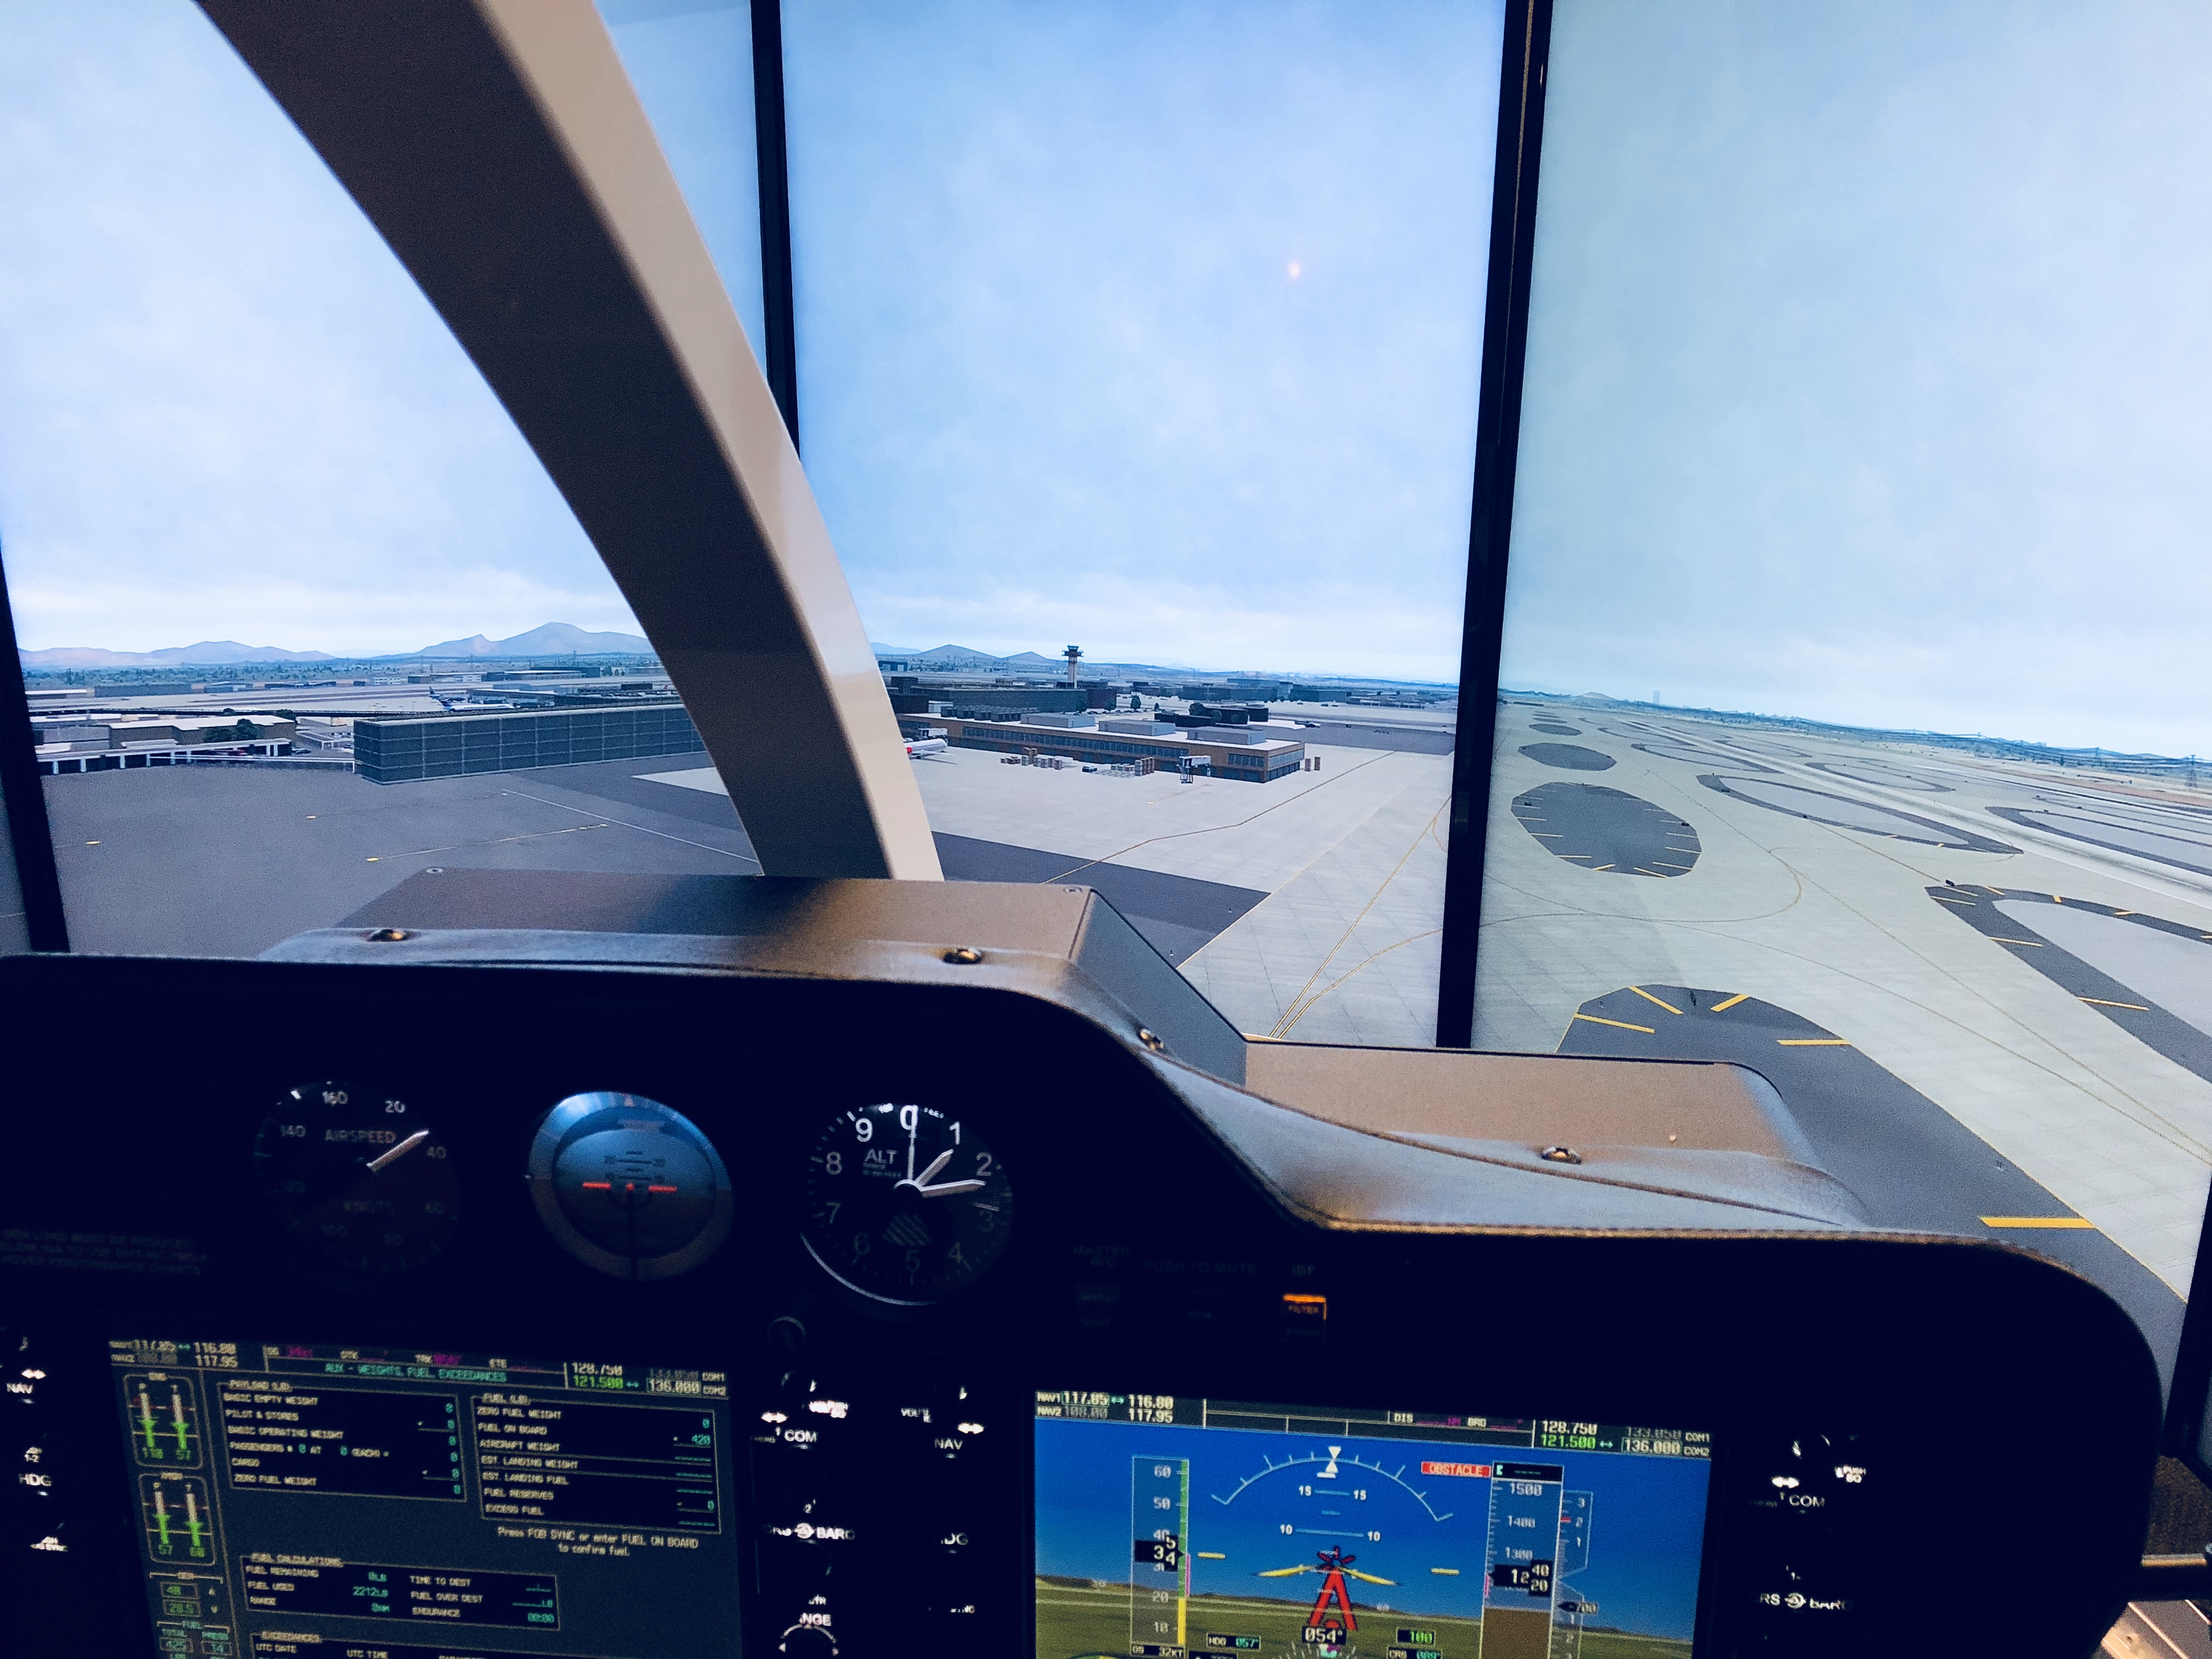 Heli-Sim - Bell 206 / 407GX - Precision Flight Controls